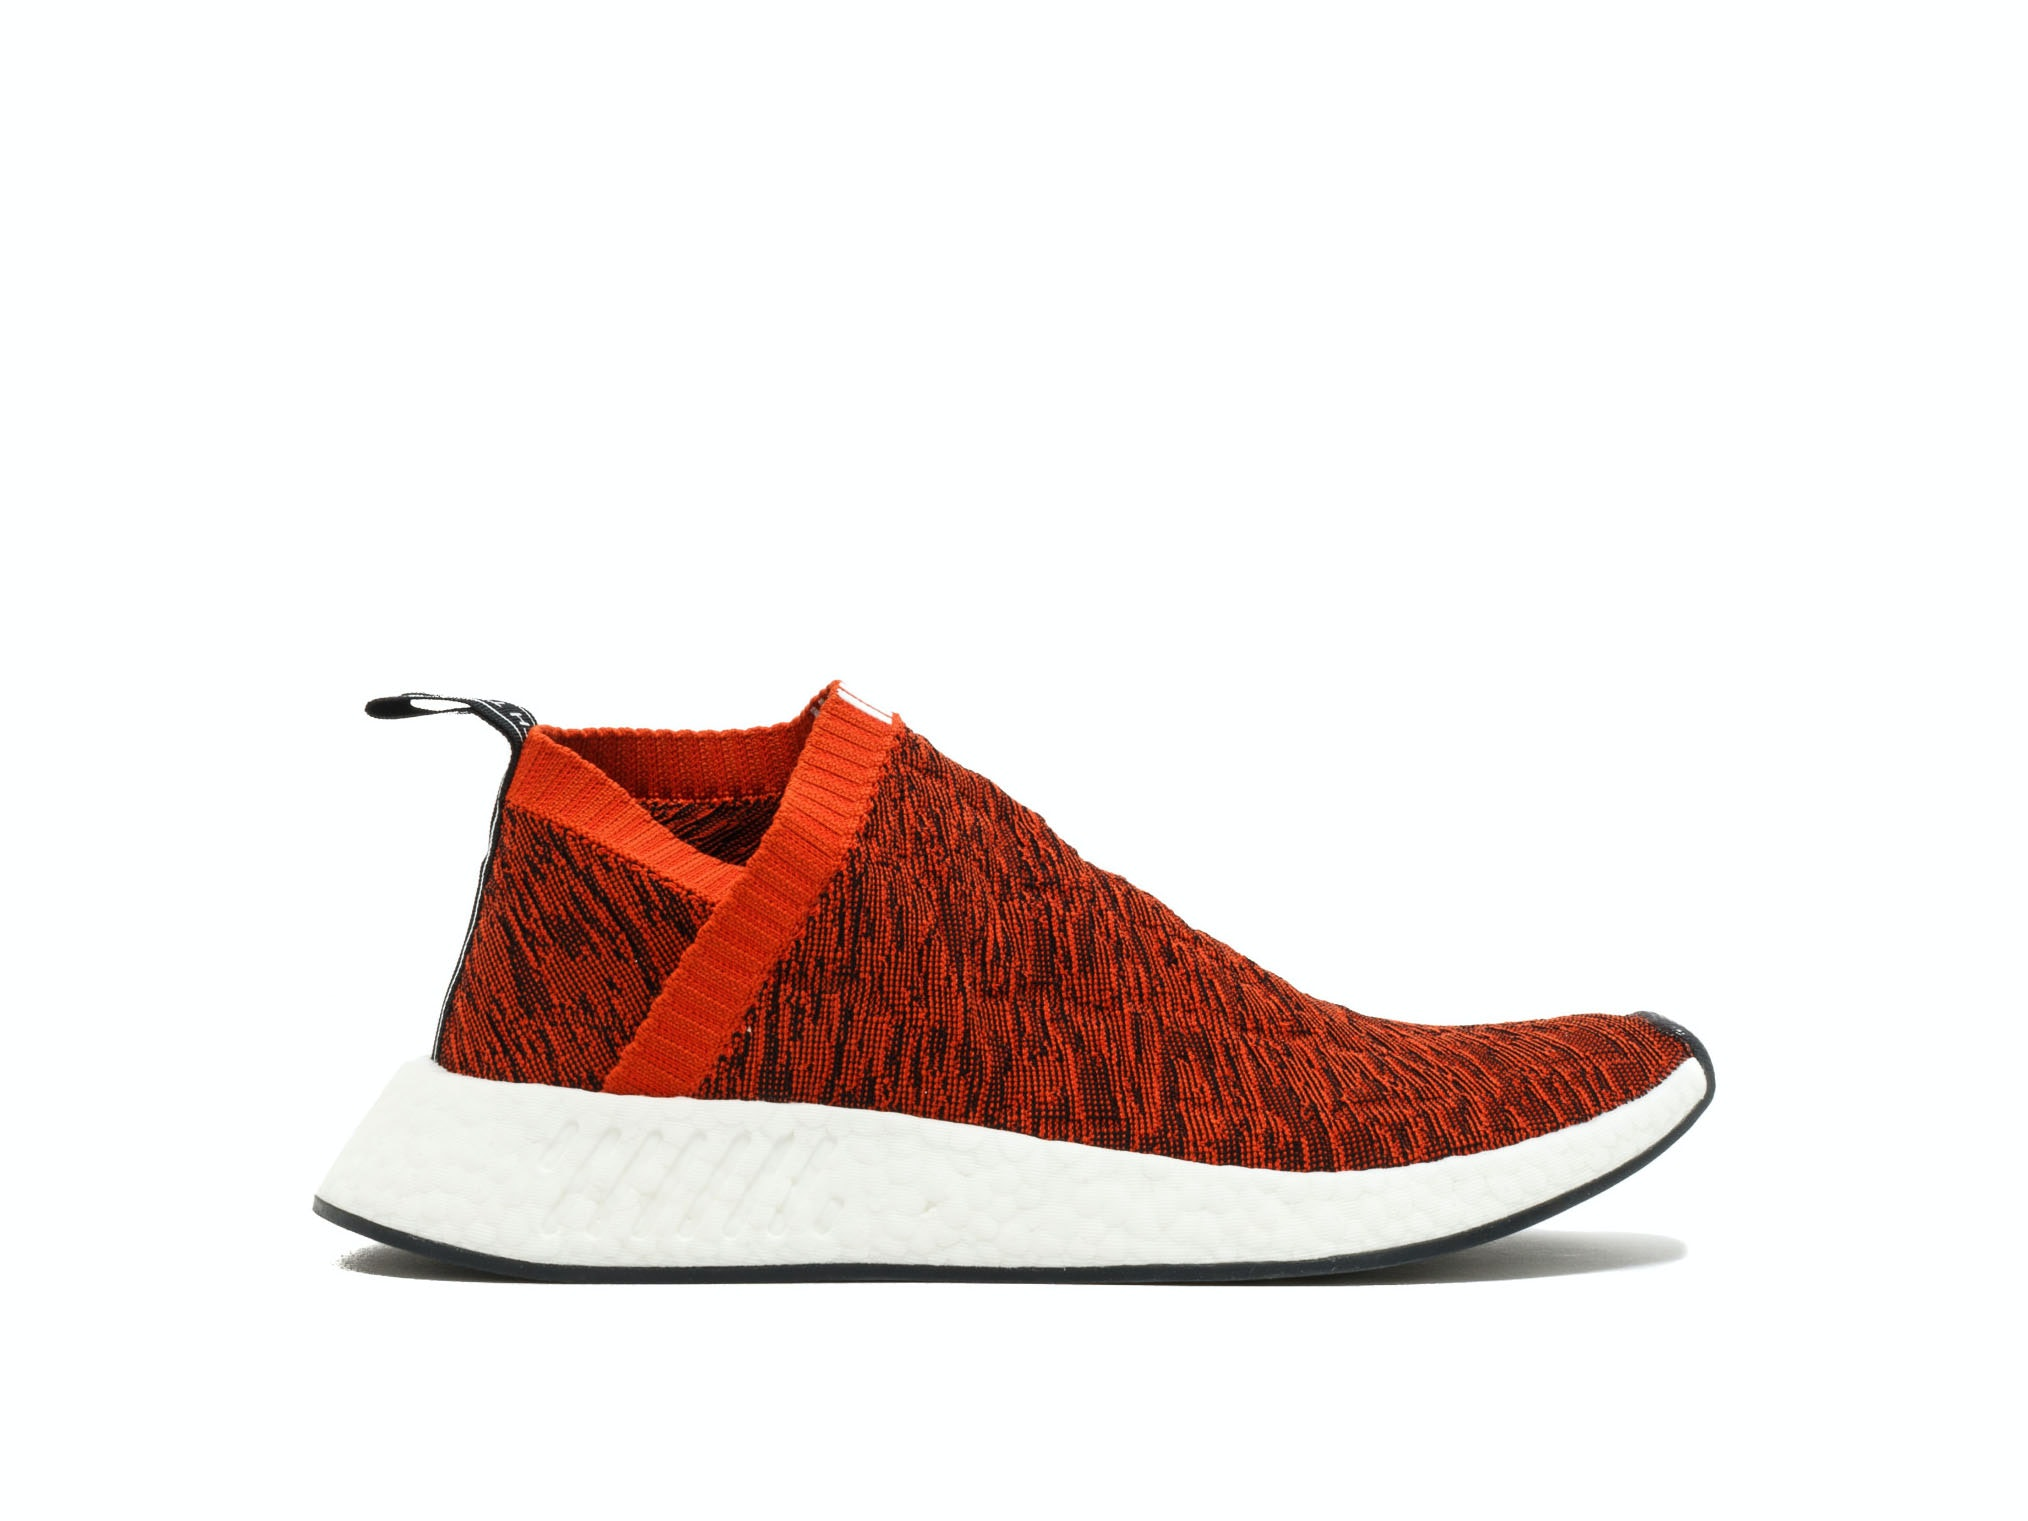 fde5fc7021ec0 Shop Red Glitch Primeknit NMD CS2 Online